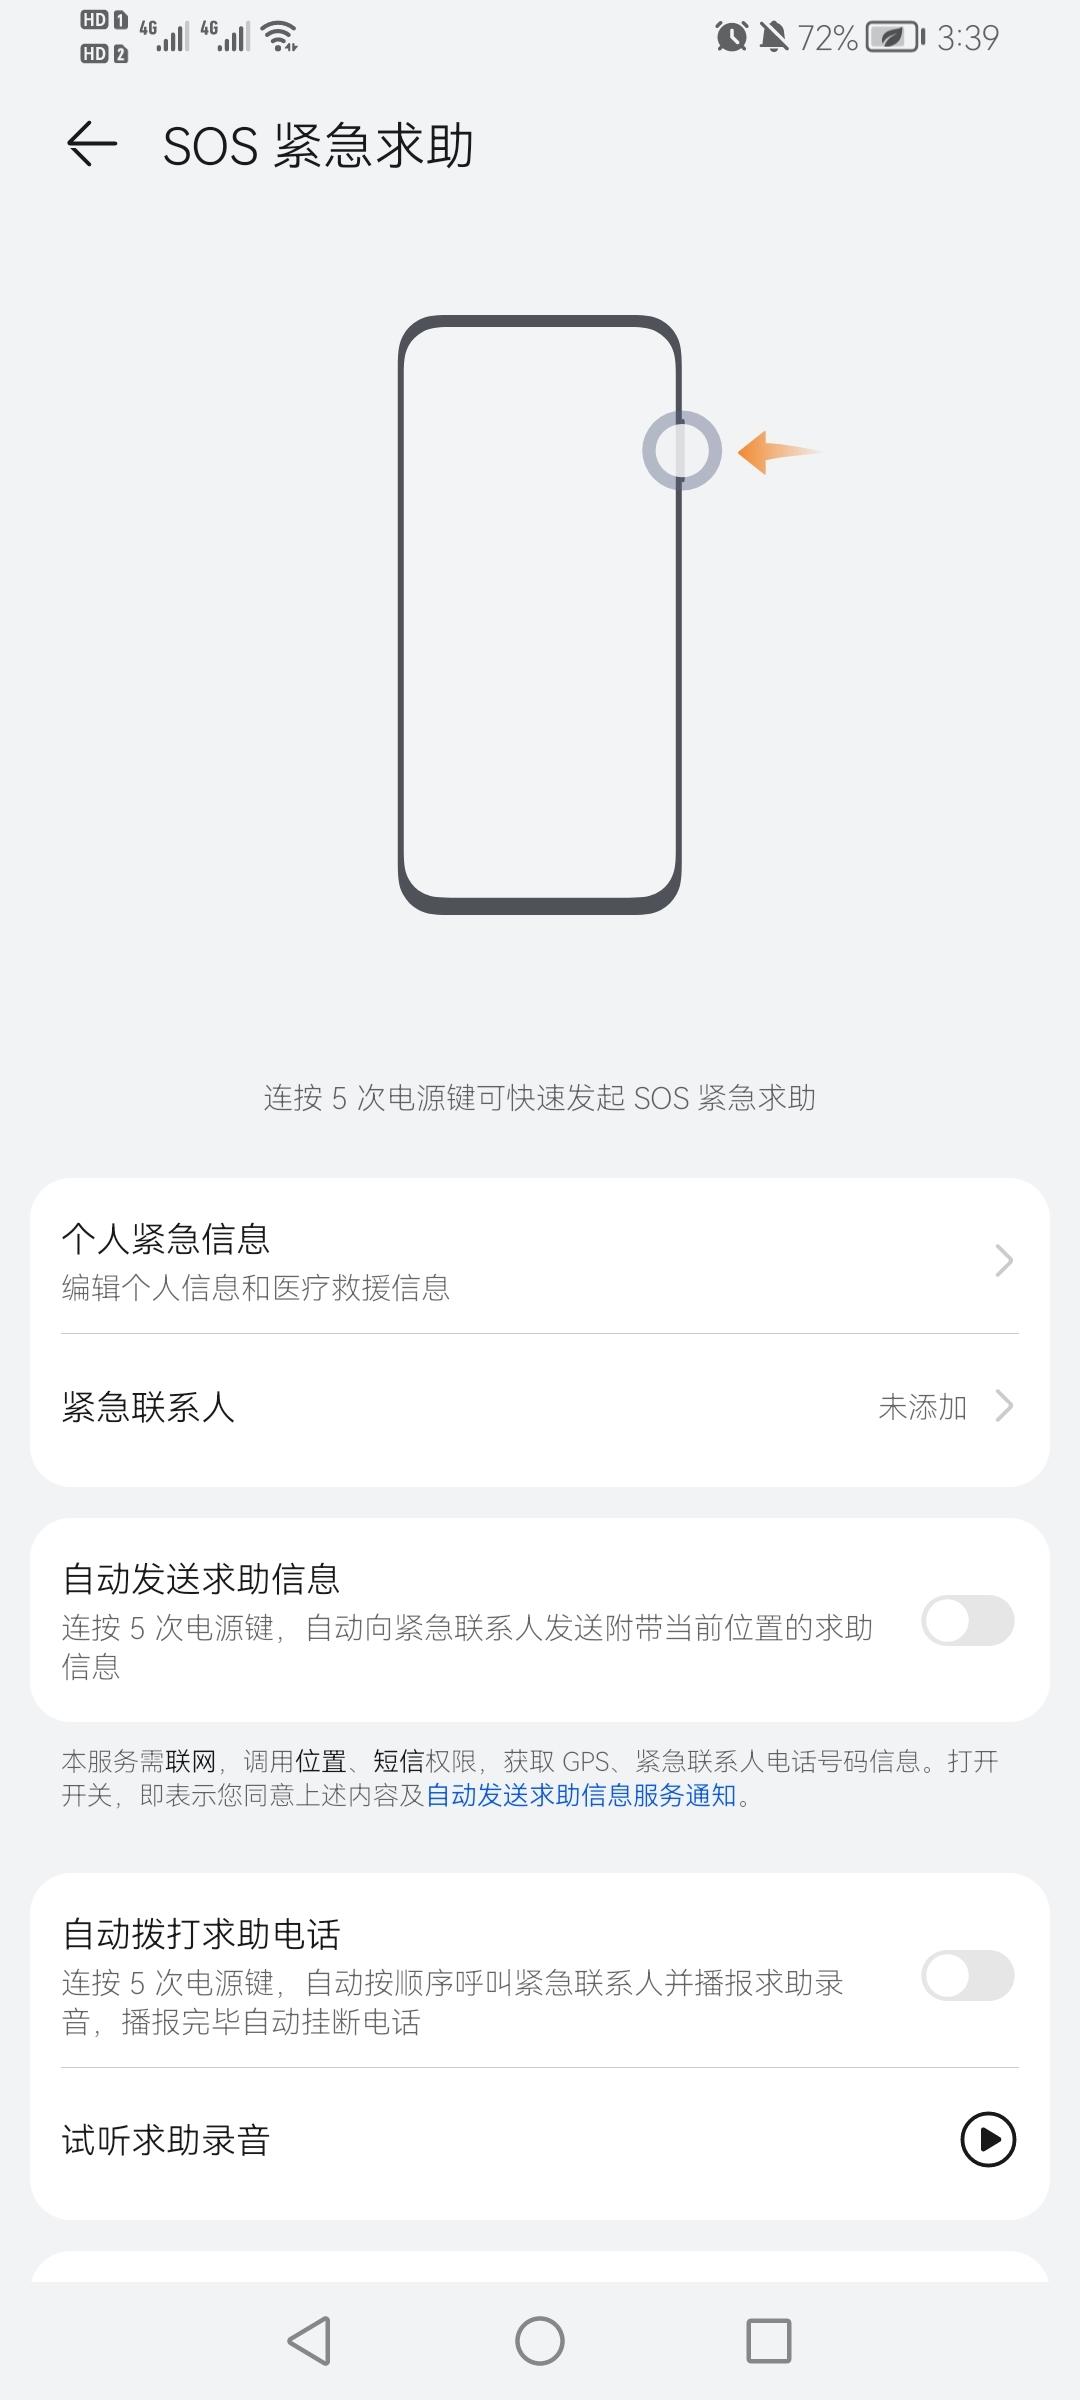 Screenshot_20211017_153959_com.android.emergency.jpg